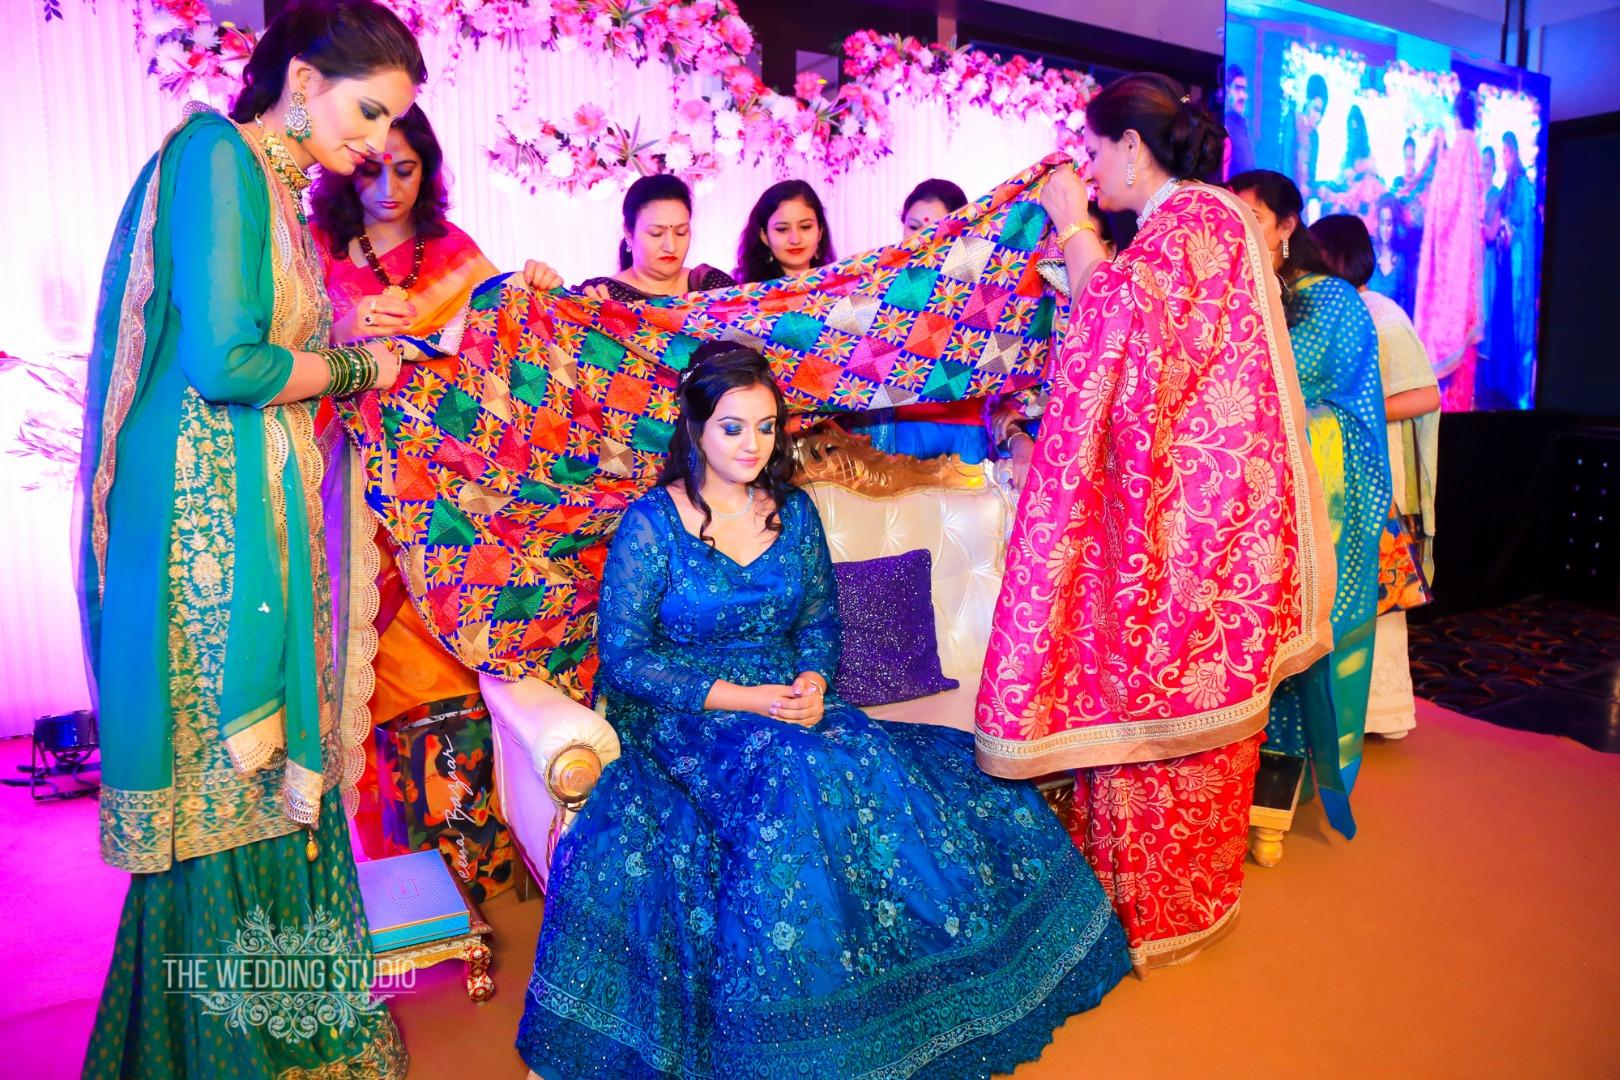 Roka Ceremony in Indian Weddings